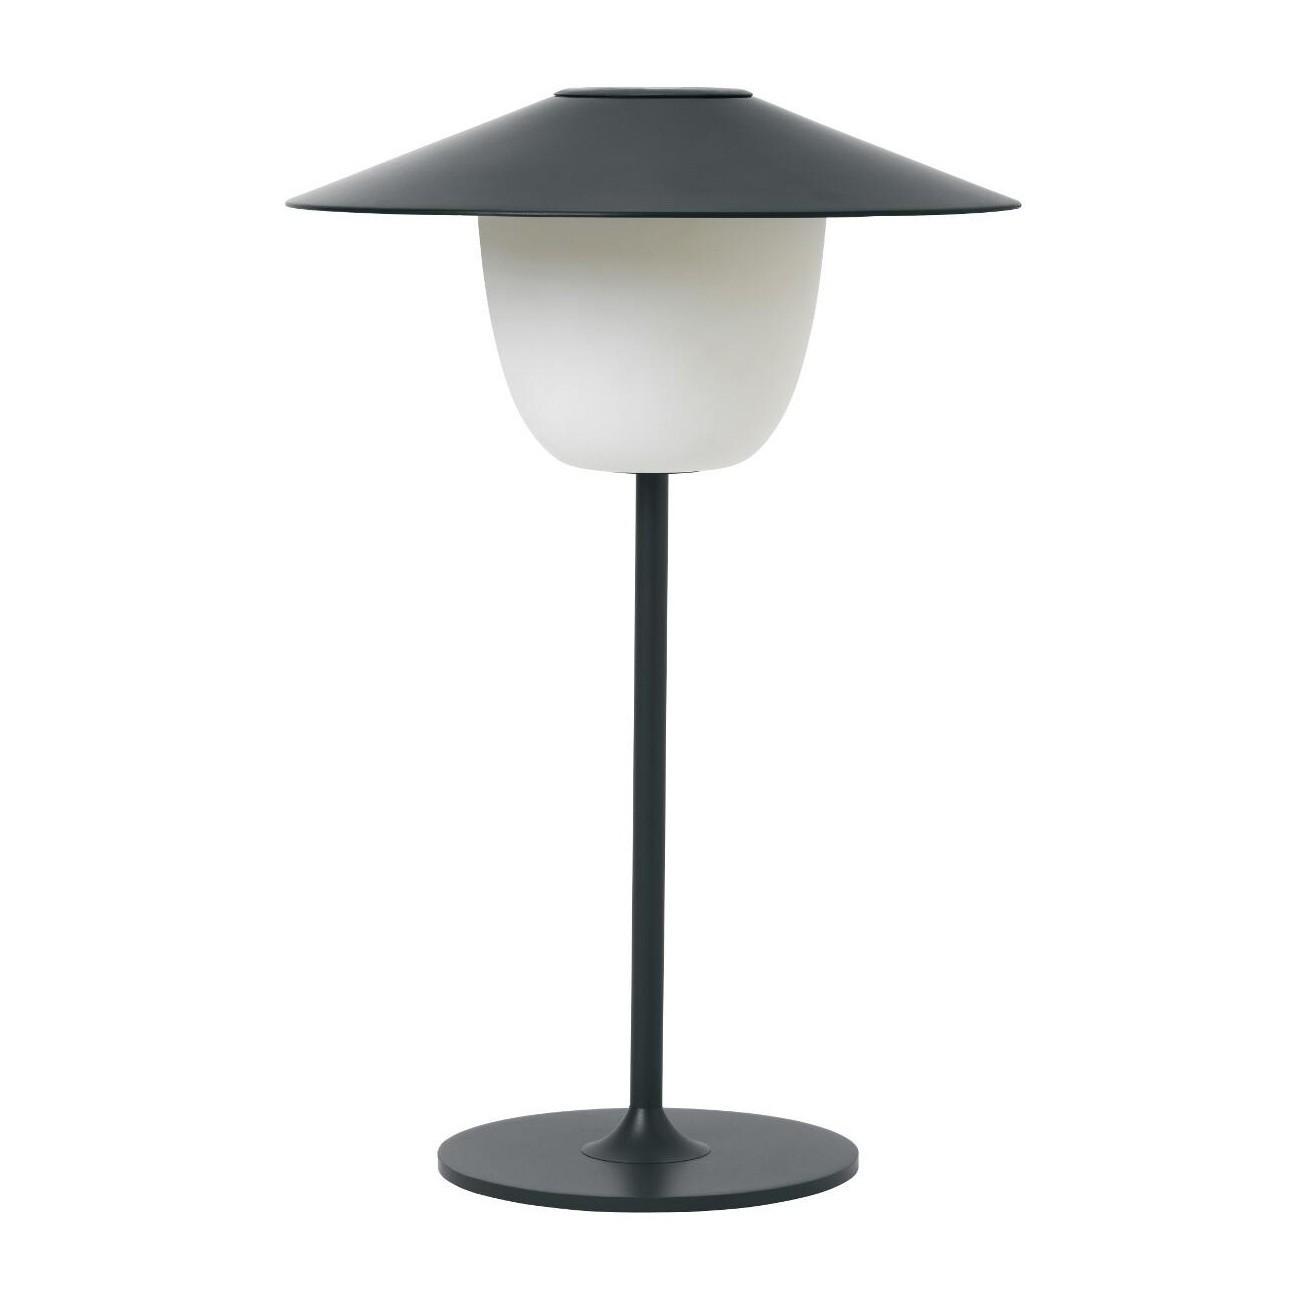 Batterie Ani Lampe Lamp Avec Led Mobile 7gbvfY6y